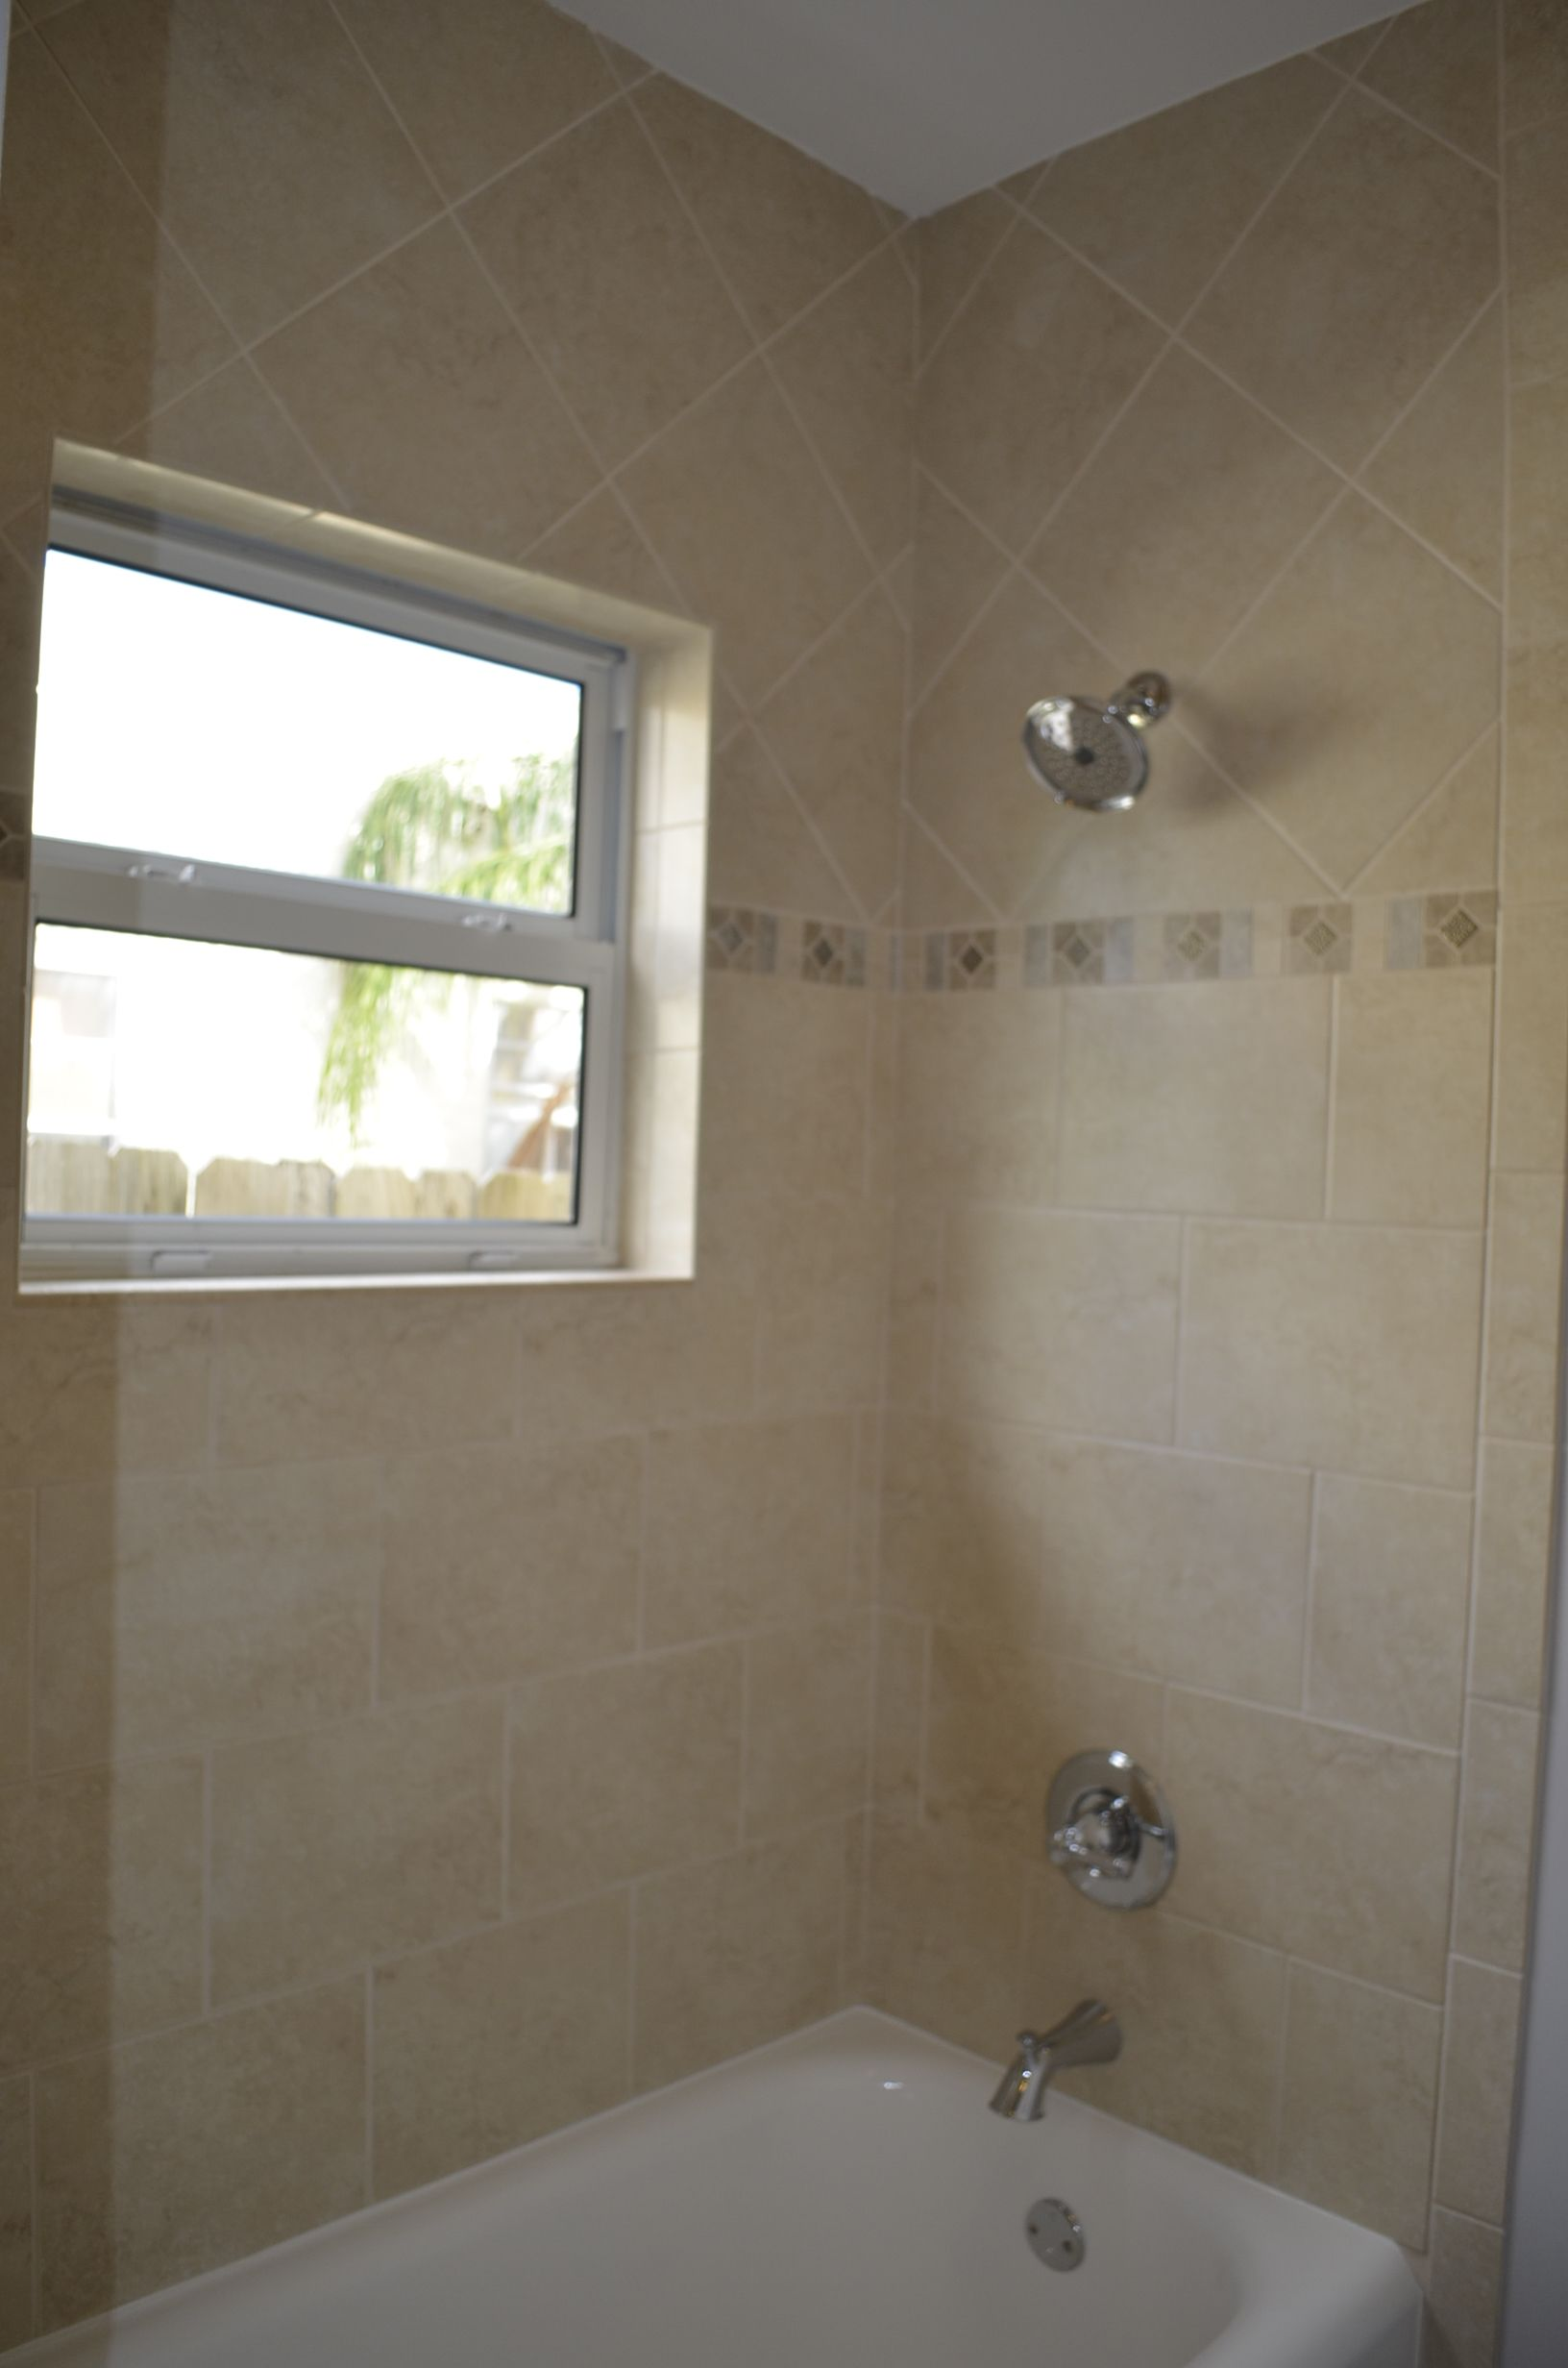 1924 historic spanish style bathroom remodel 4 2 sfh in - Bathroom remodel west palm beach ...